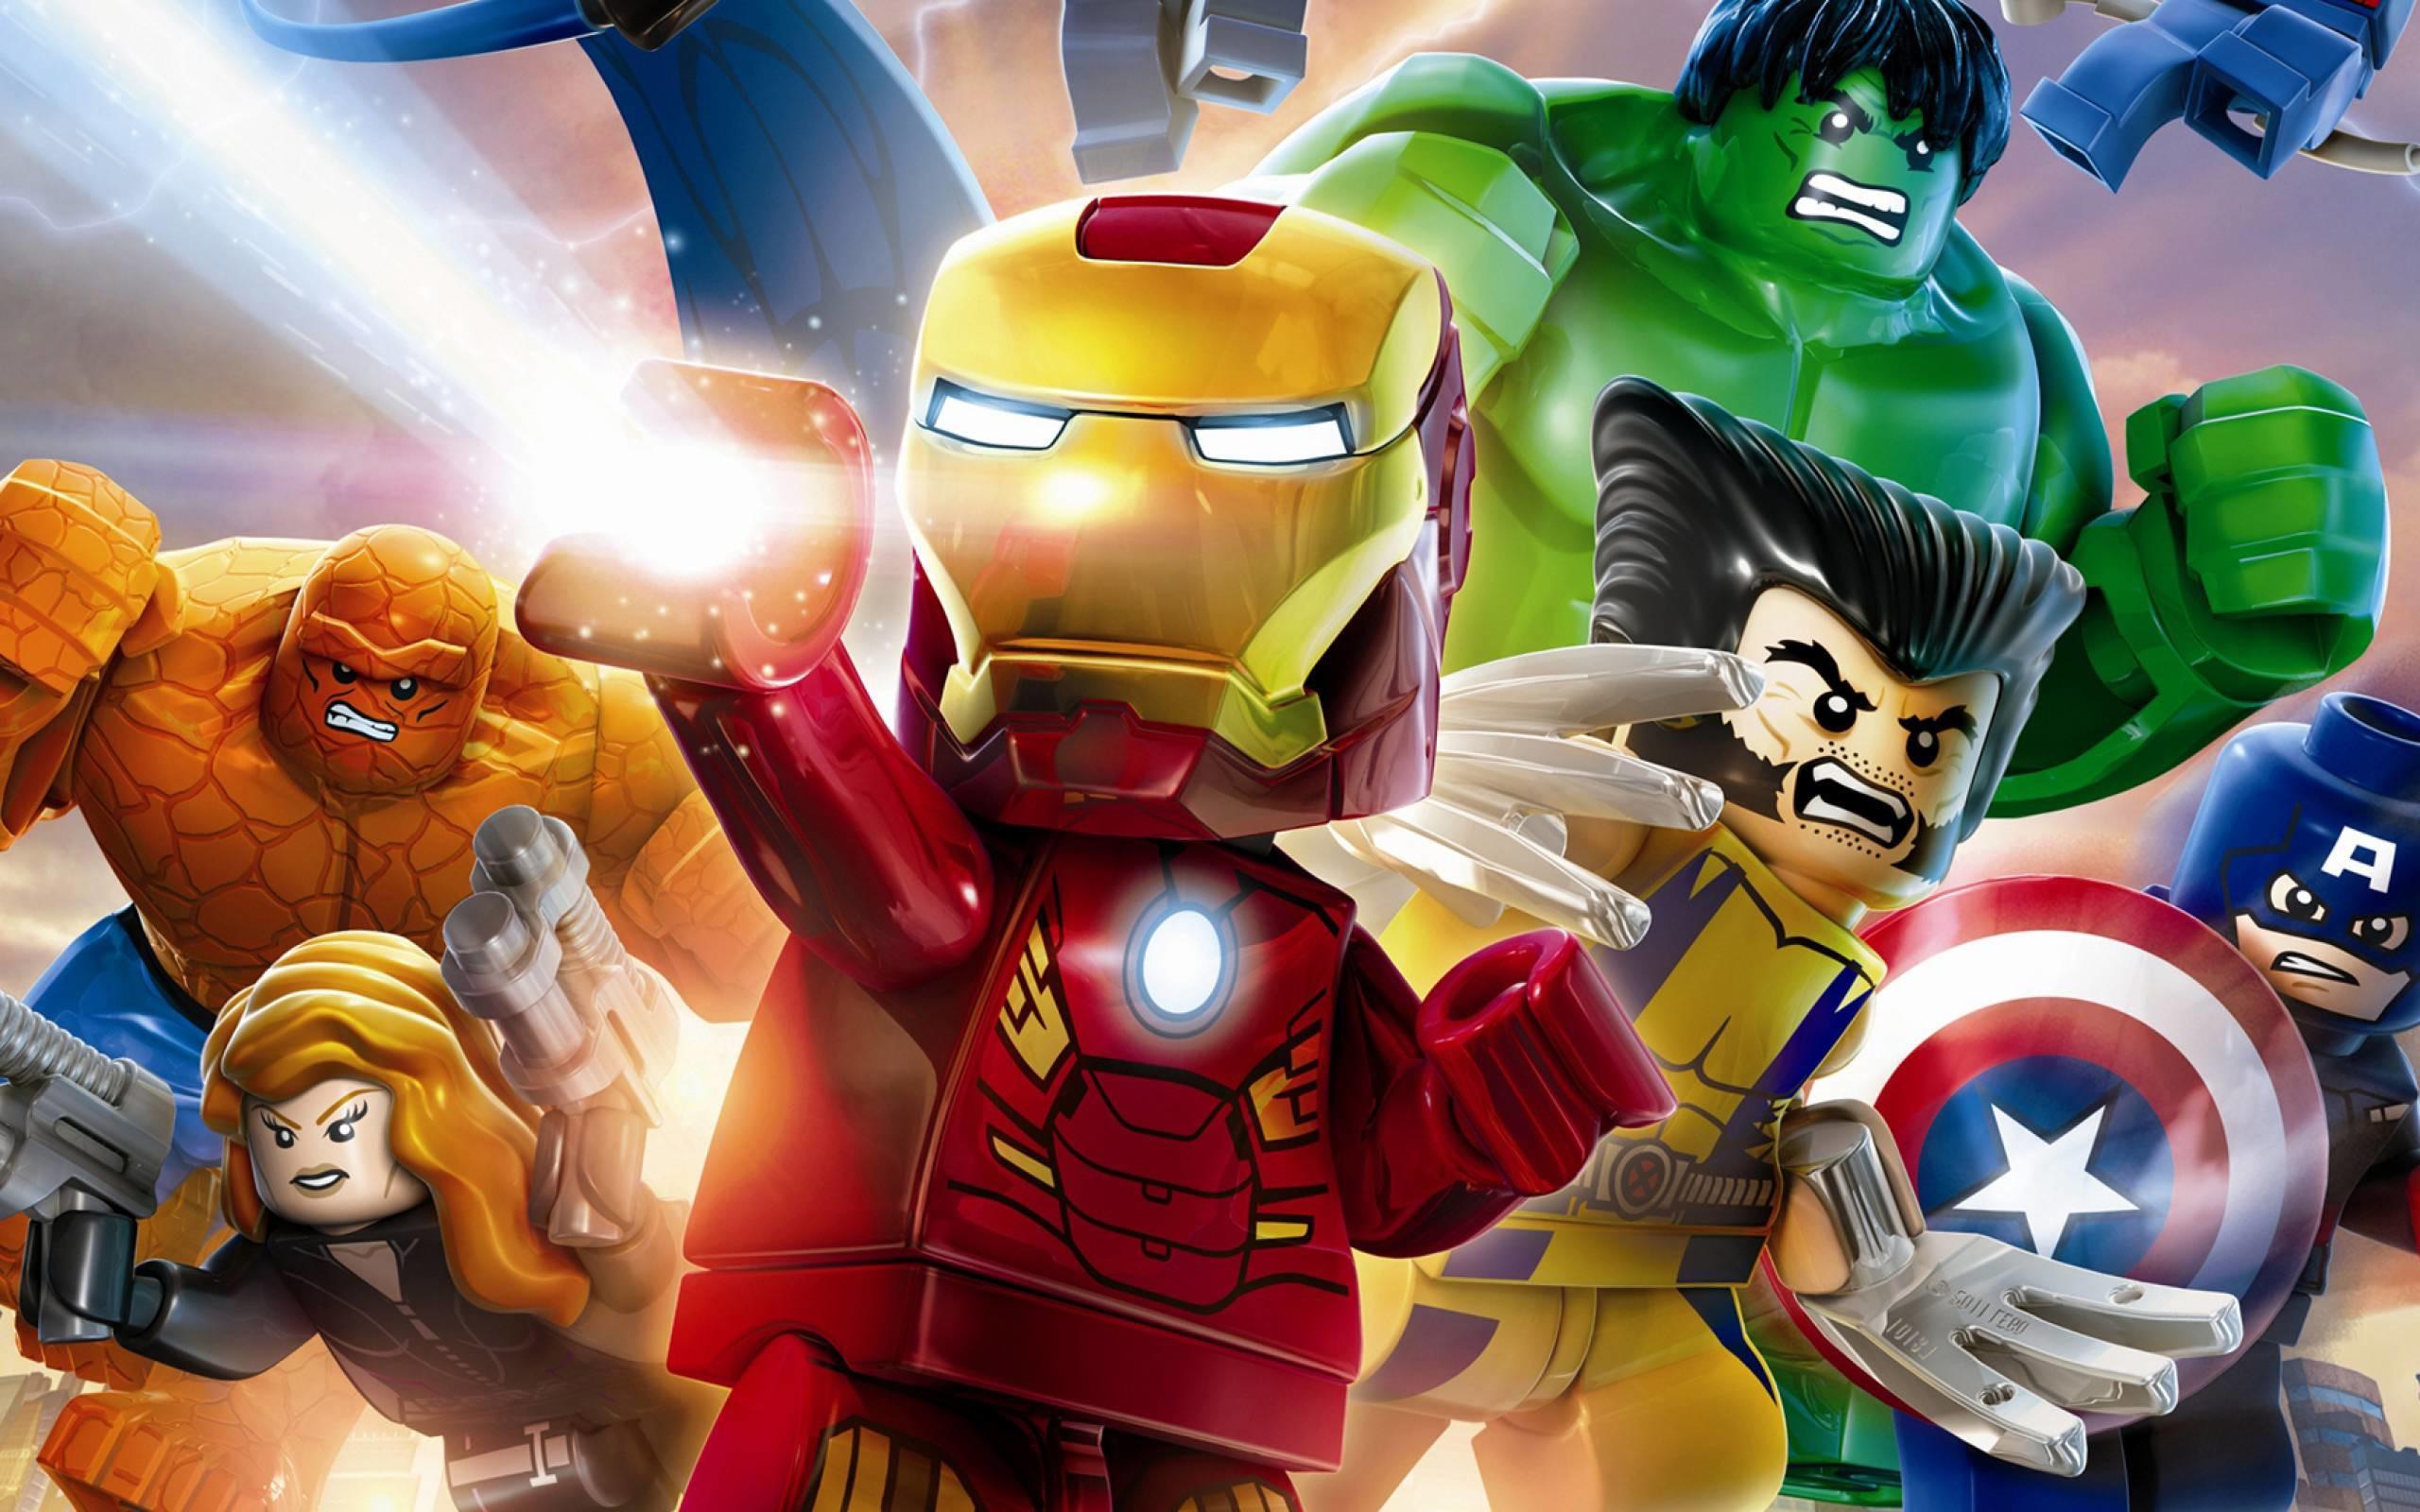 Lego Marvel Superhero Wallpaper HQ Resolution #56341 – Ehiyo.